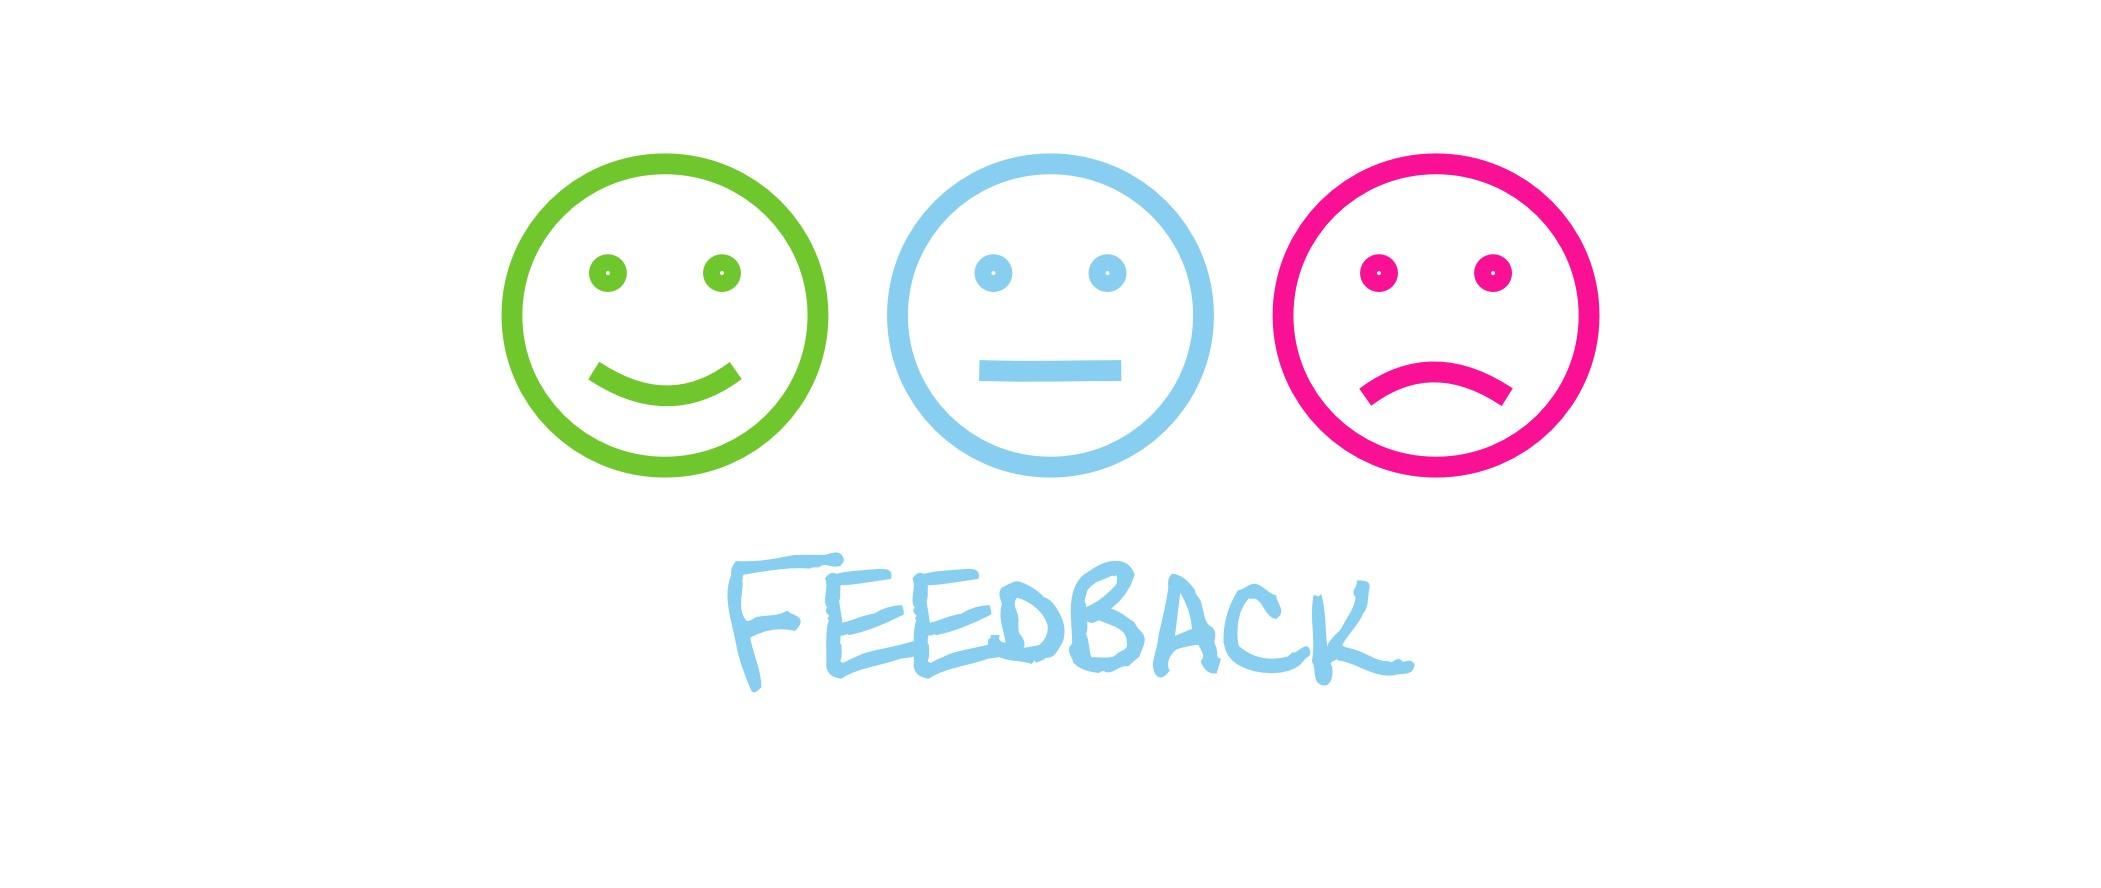 feedback-1-e1516653964781.jpg